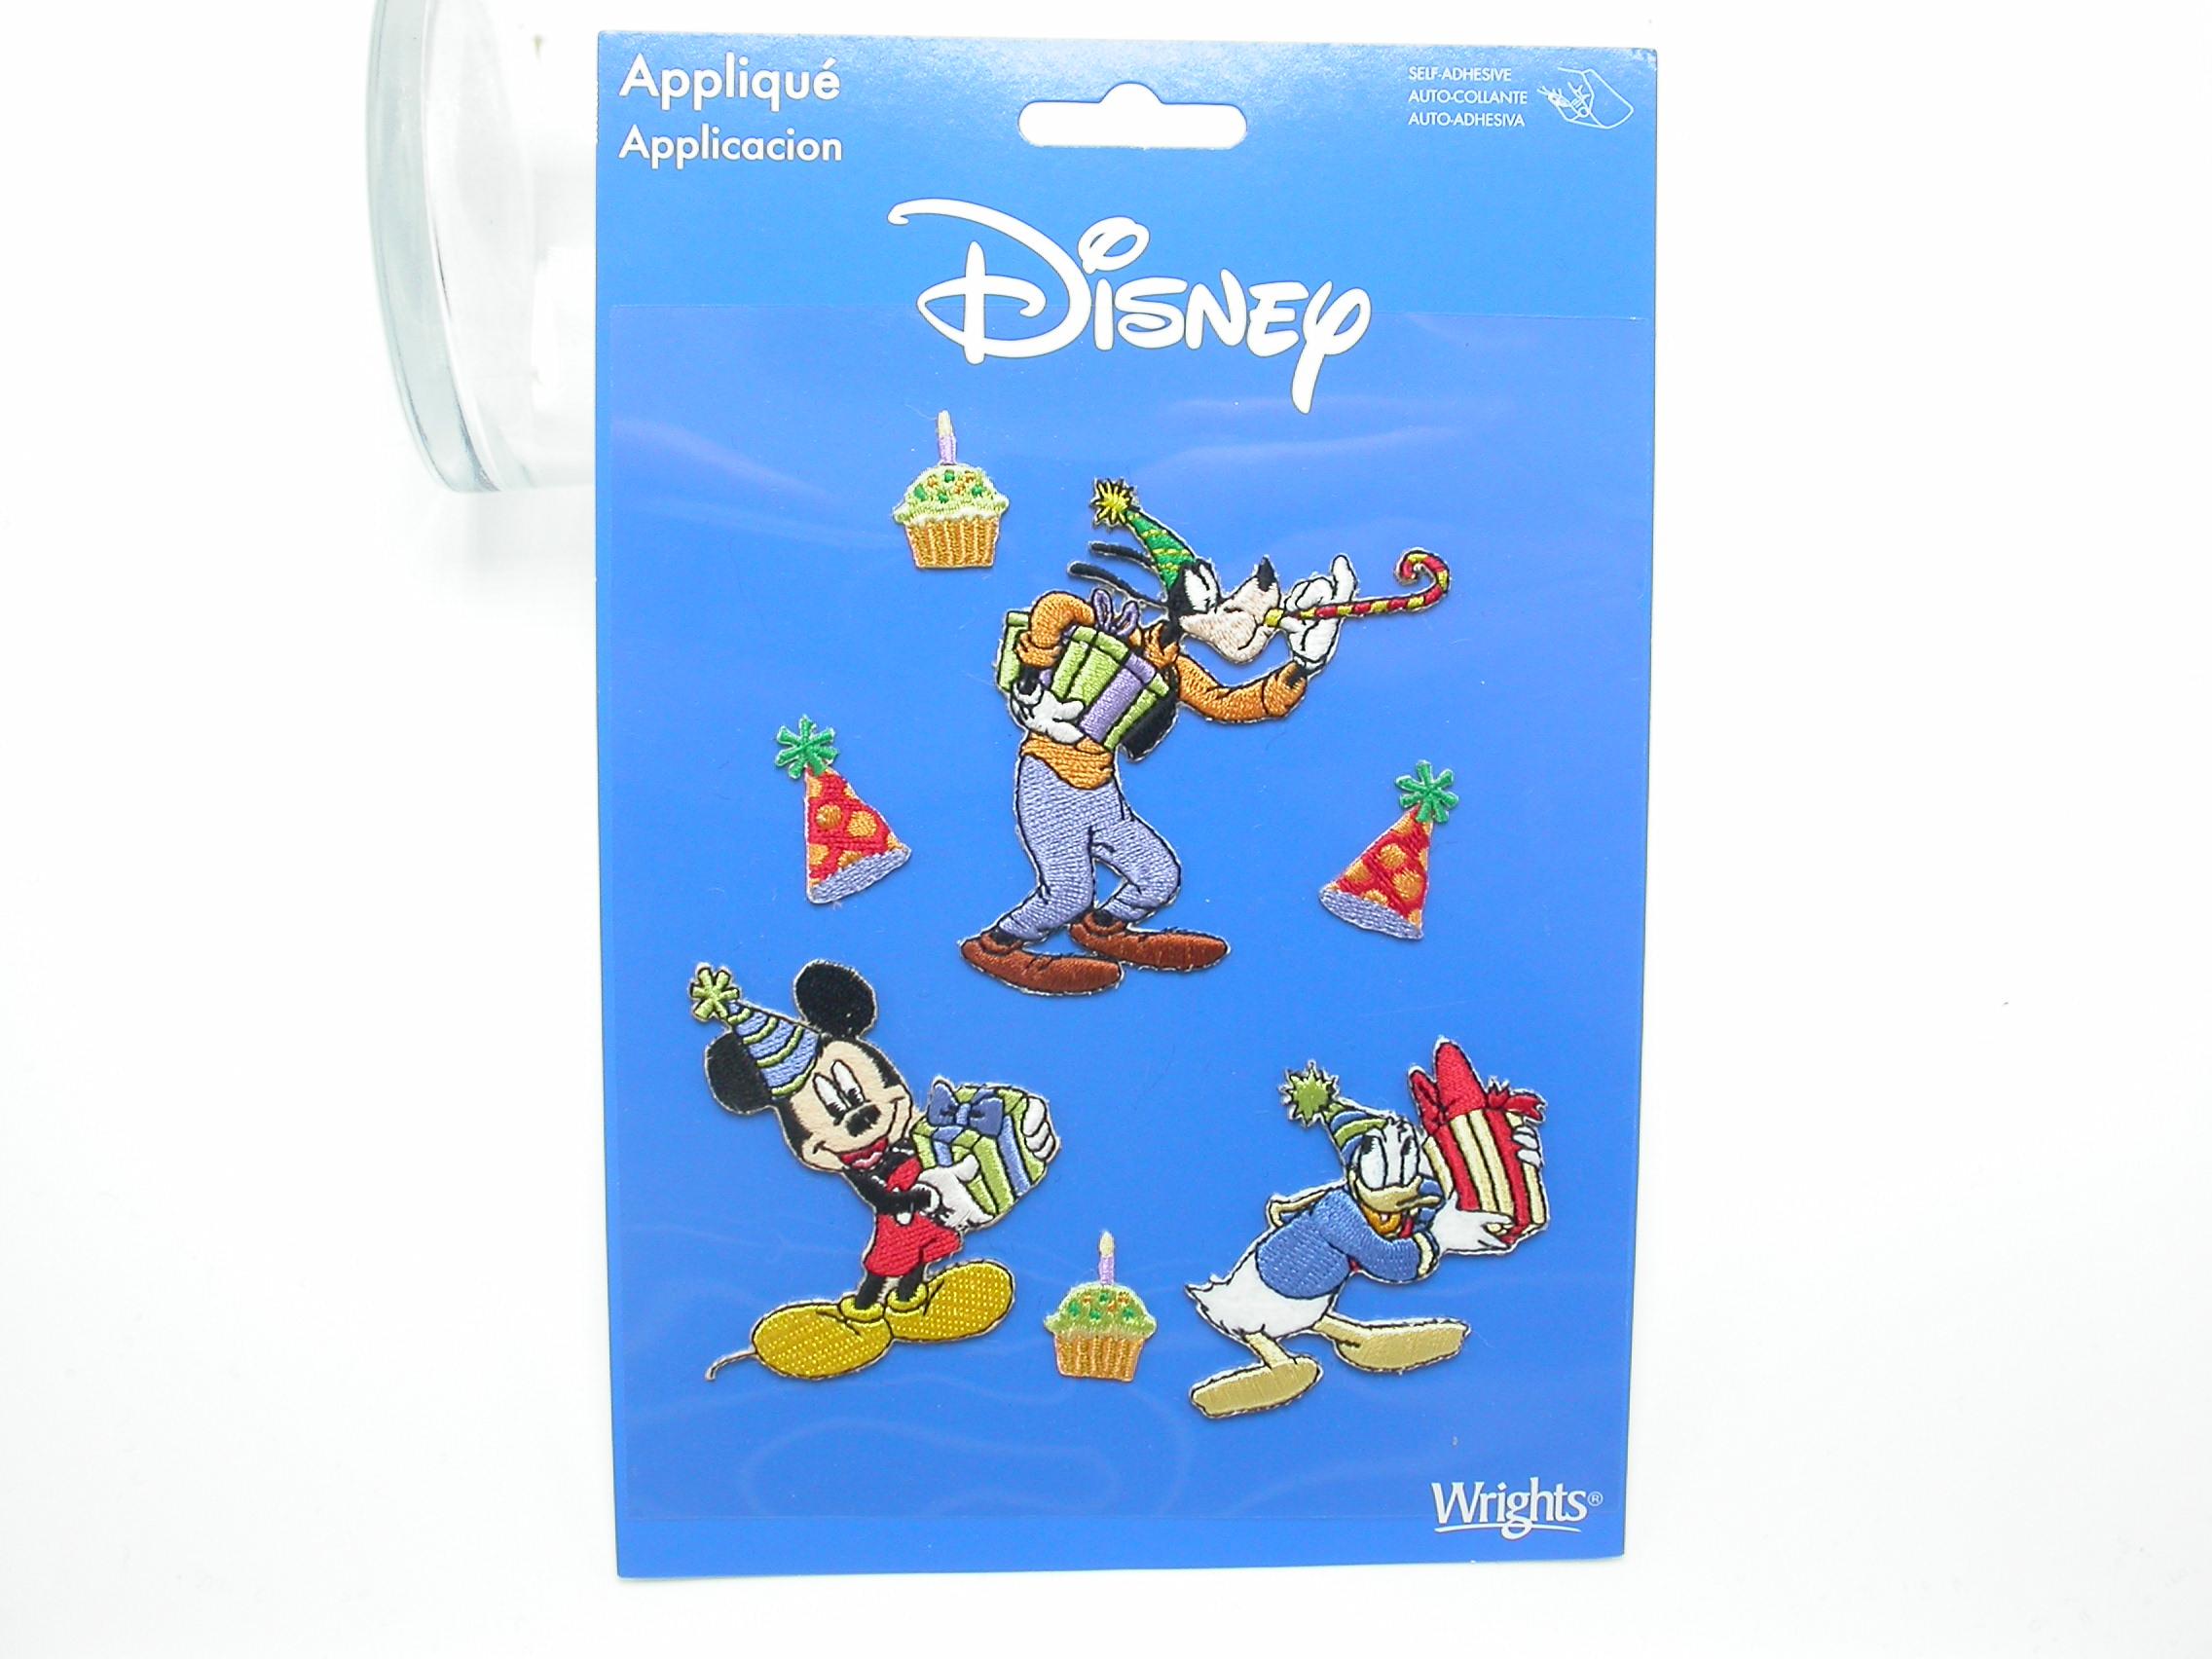 Disney Character Party Ensemble Self Adhesive Appliques